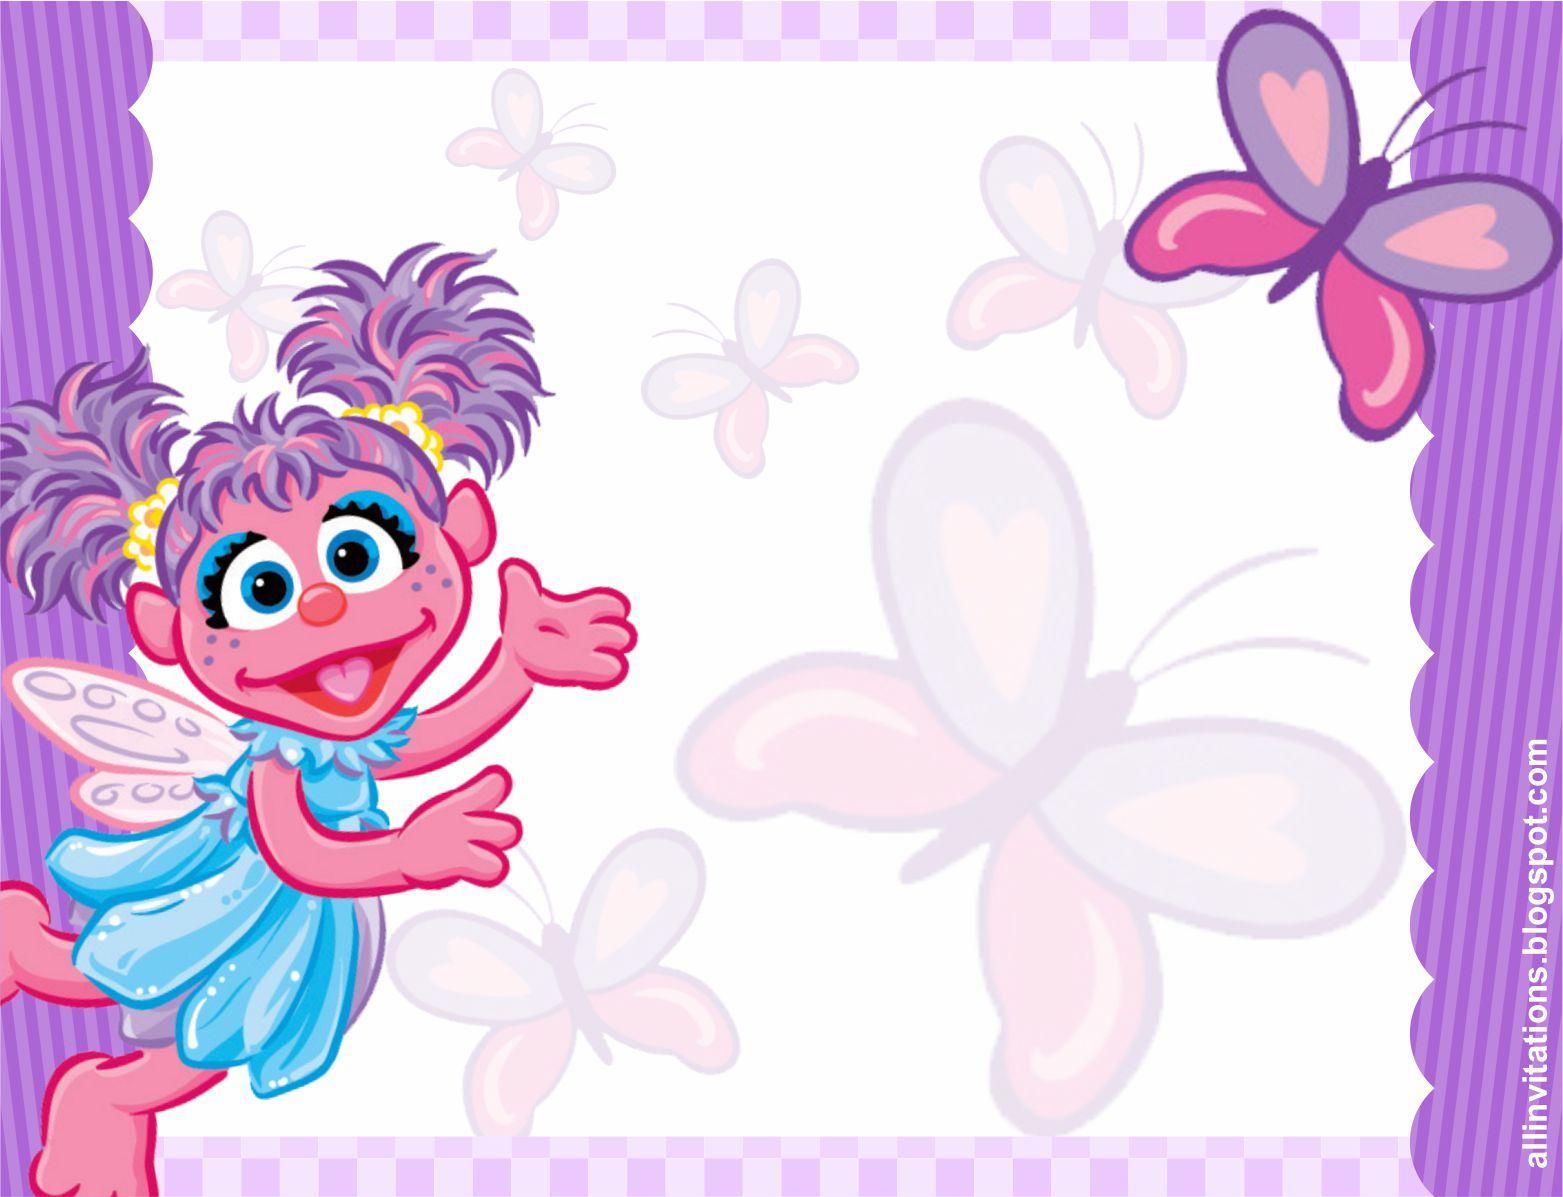 Plantilla invitación Abby Cadabby | mis archivos | Pinterest | Birthdays